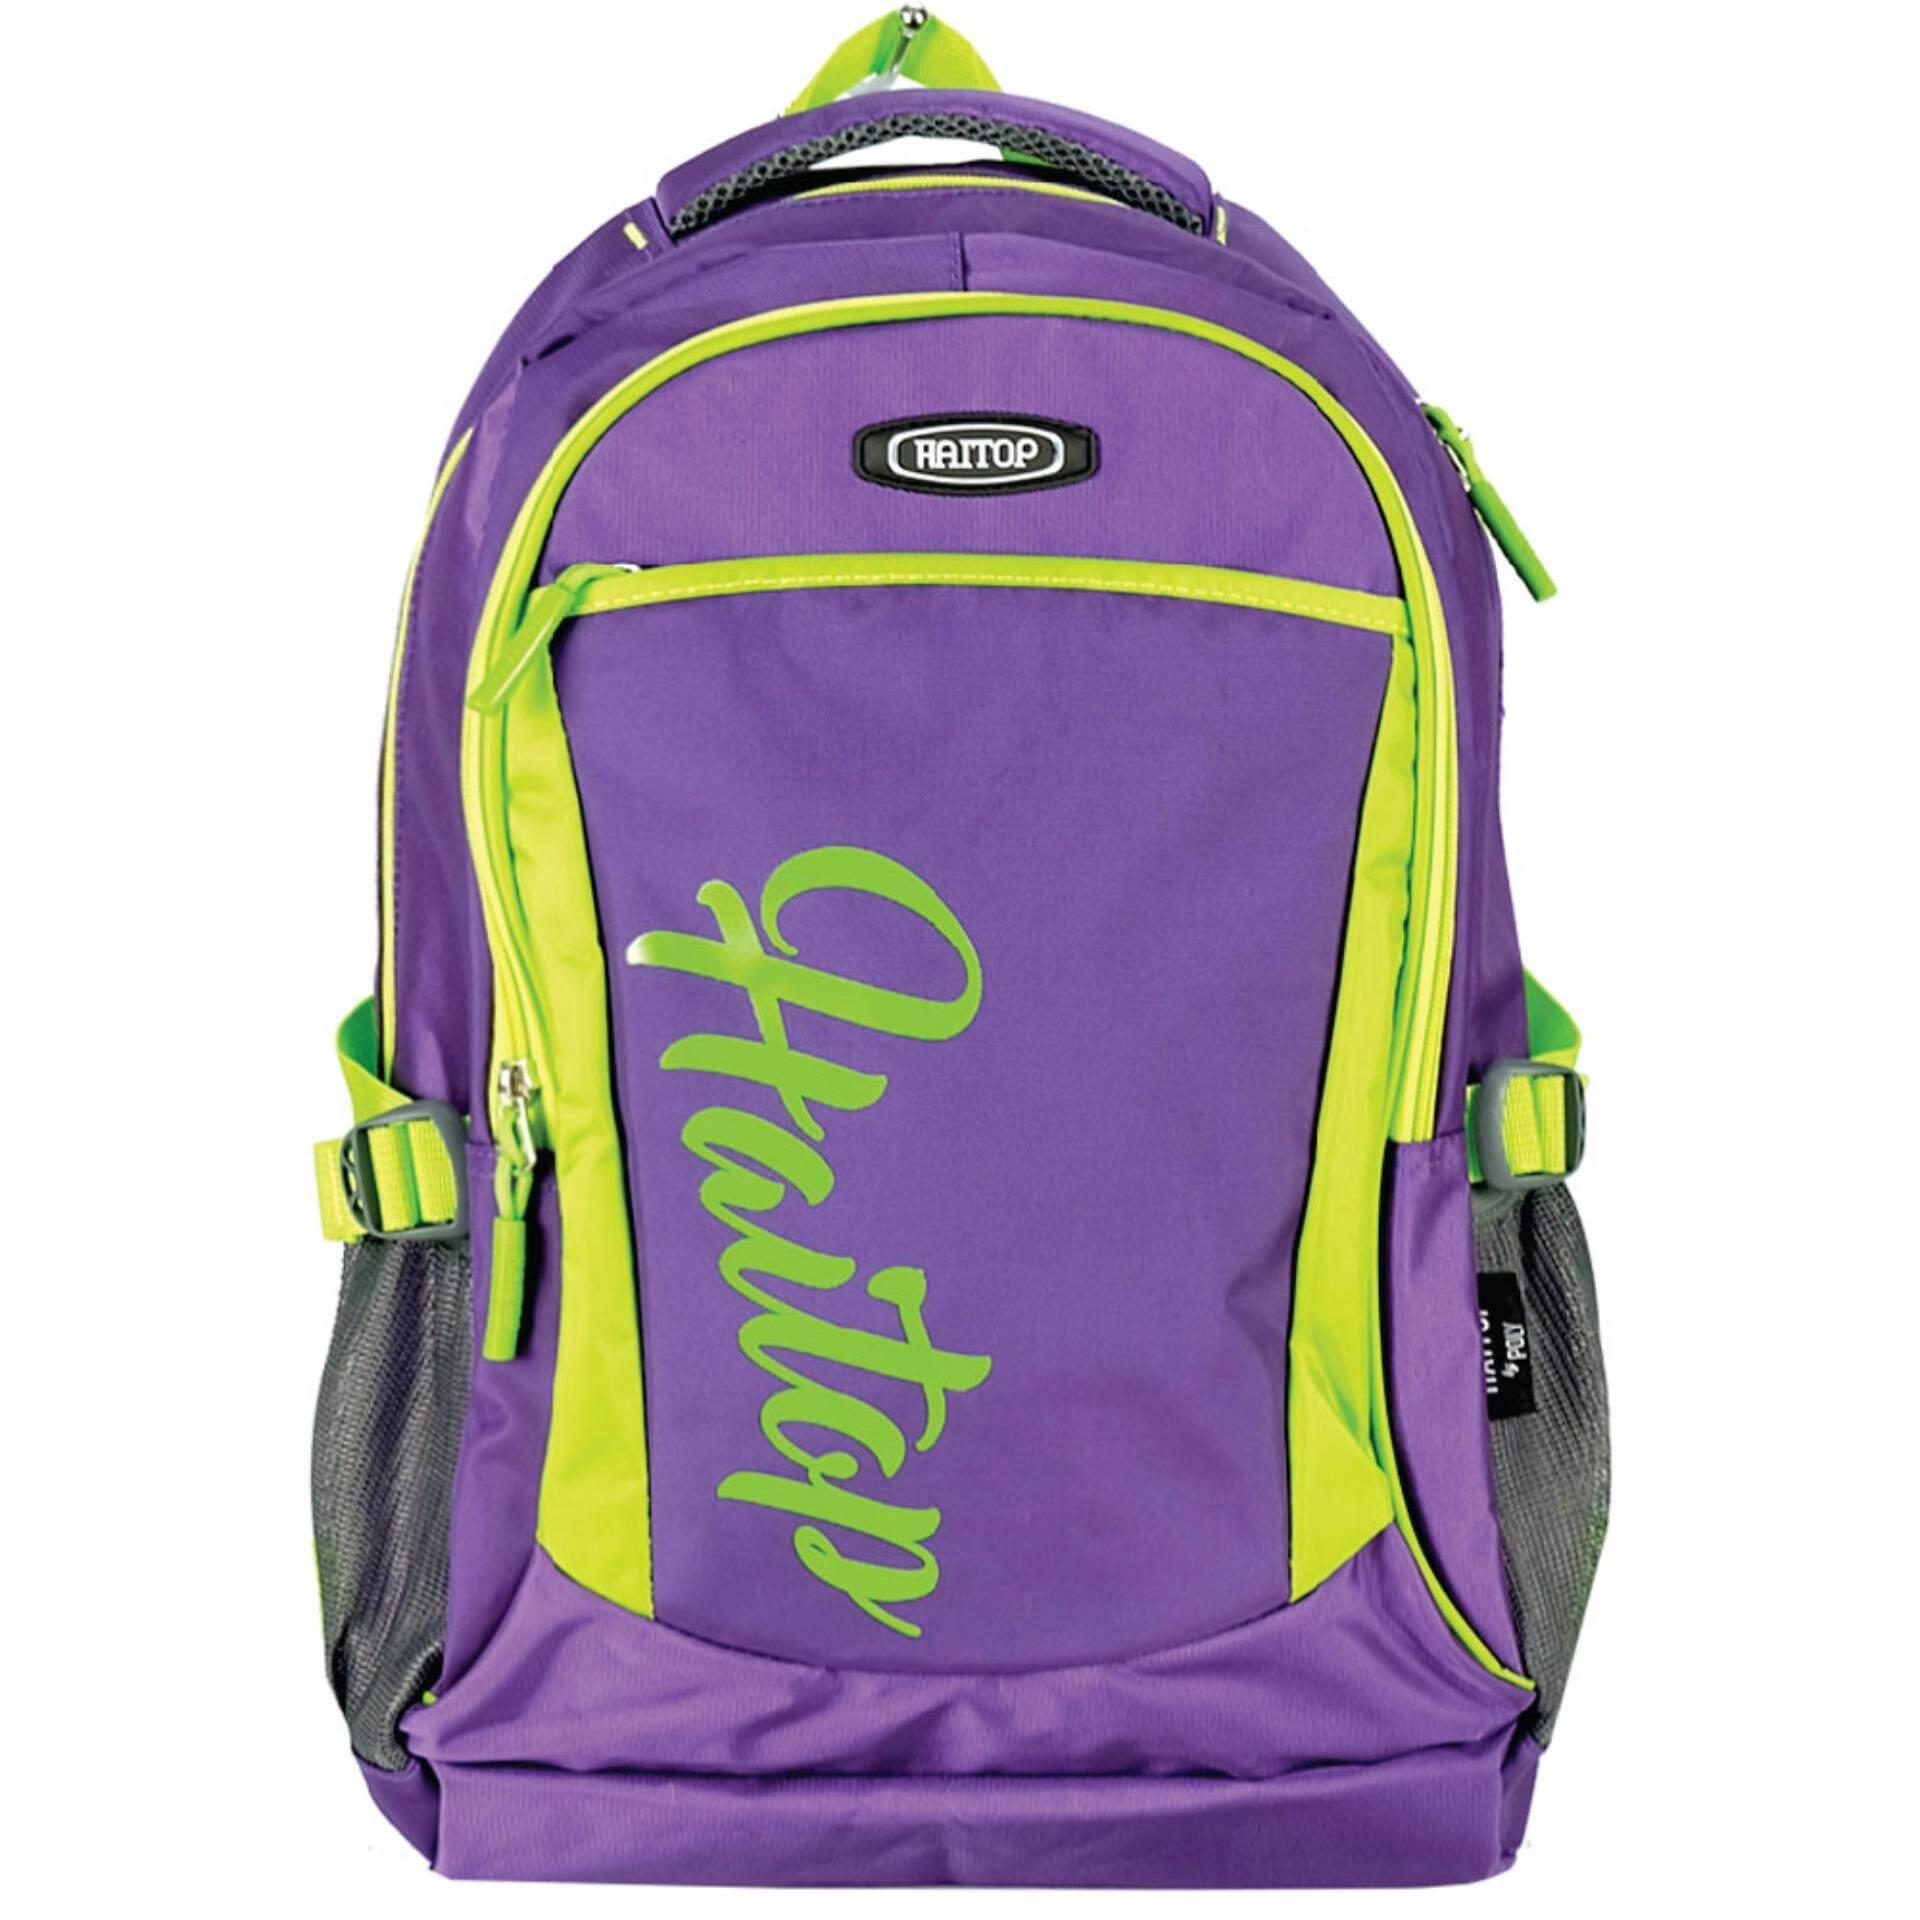 Haitop HN1662 19'' Notebook Backpack (Purple/Green)